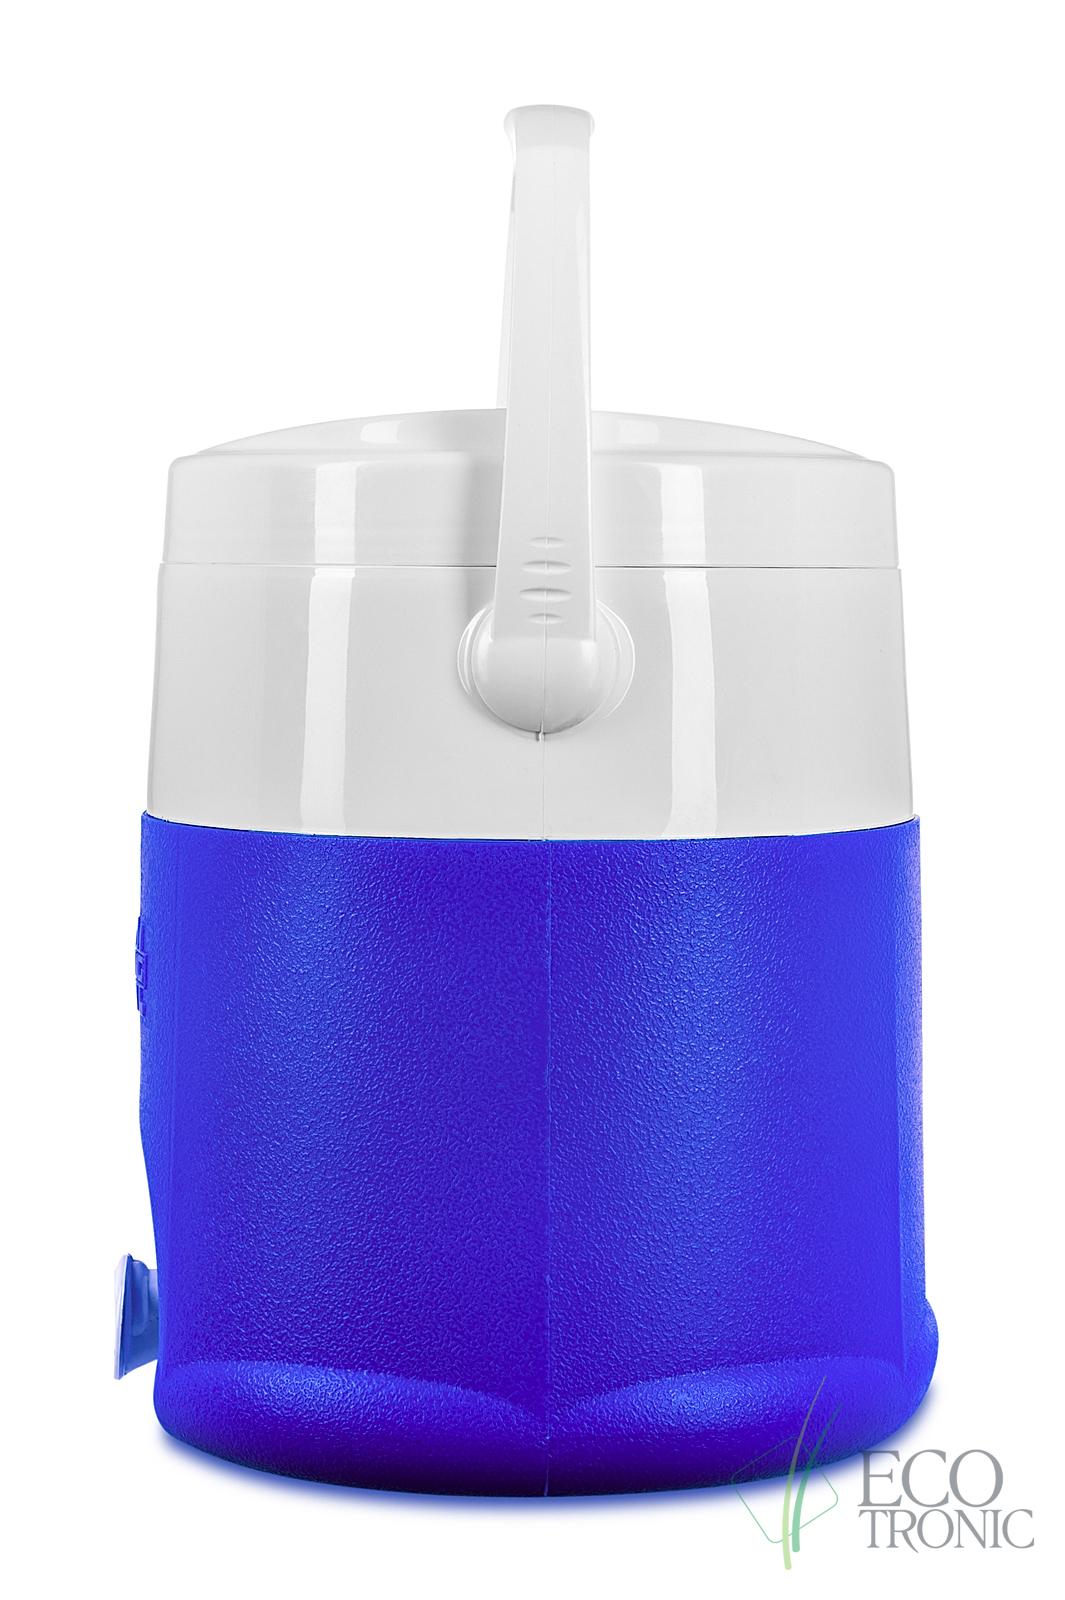 Термос-раздатчик Ecotronic CoolStrong-13 Blue